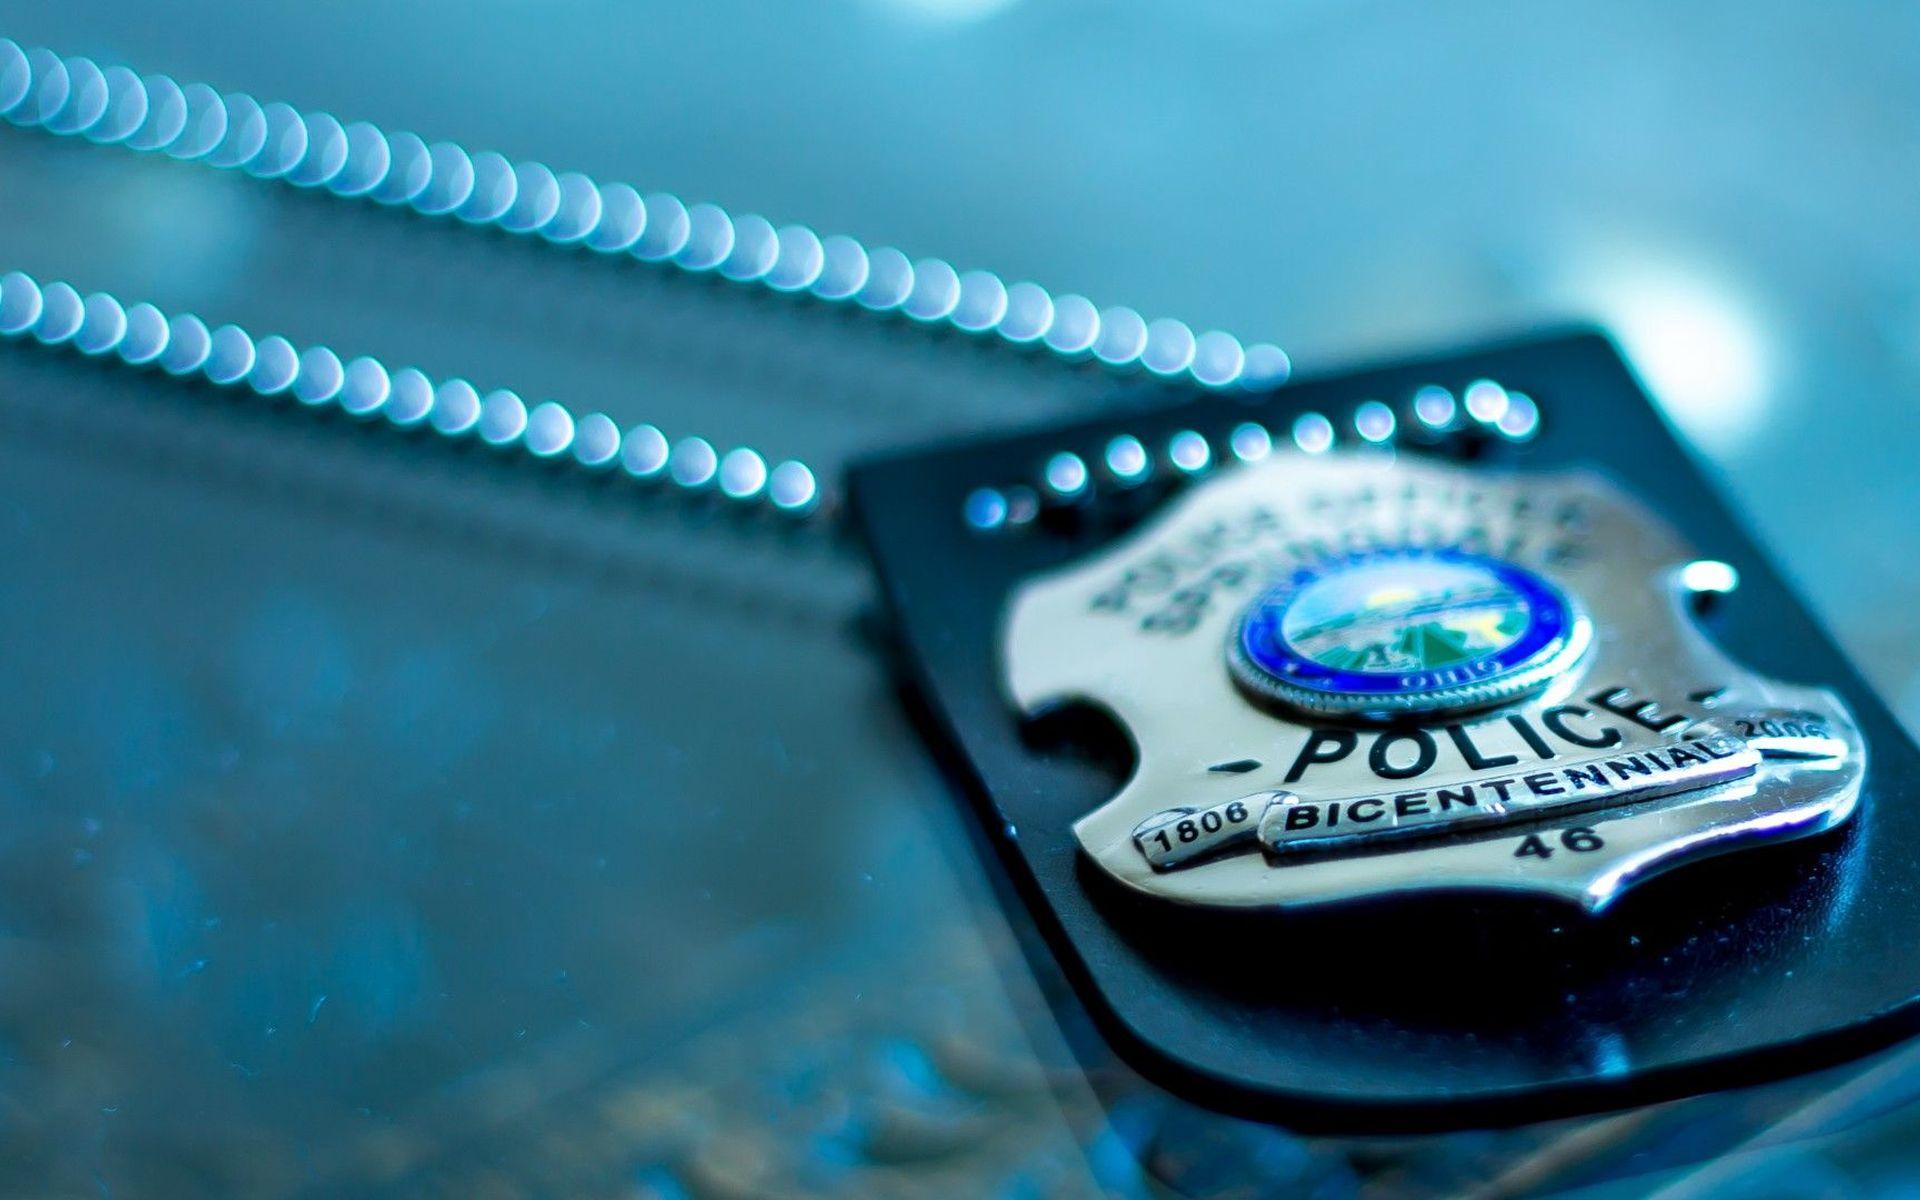 detetive particular, Detetive particular X Detetive Policial: qual a diferença?